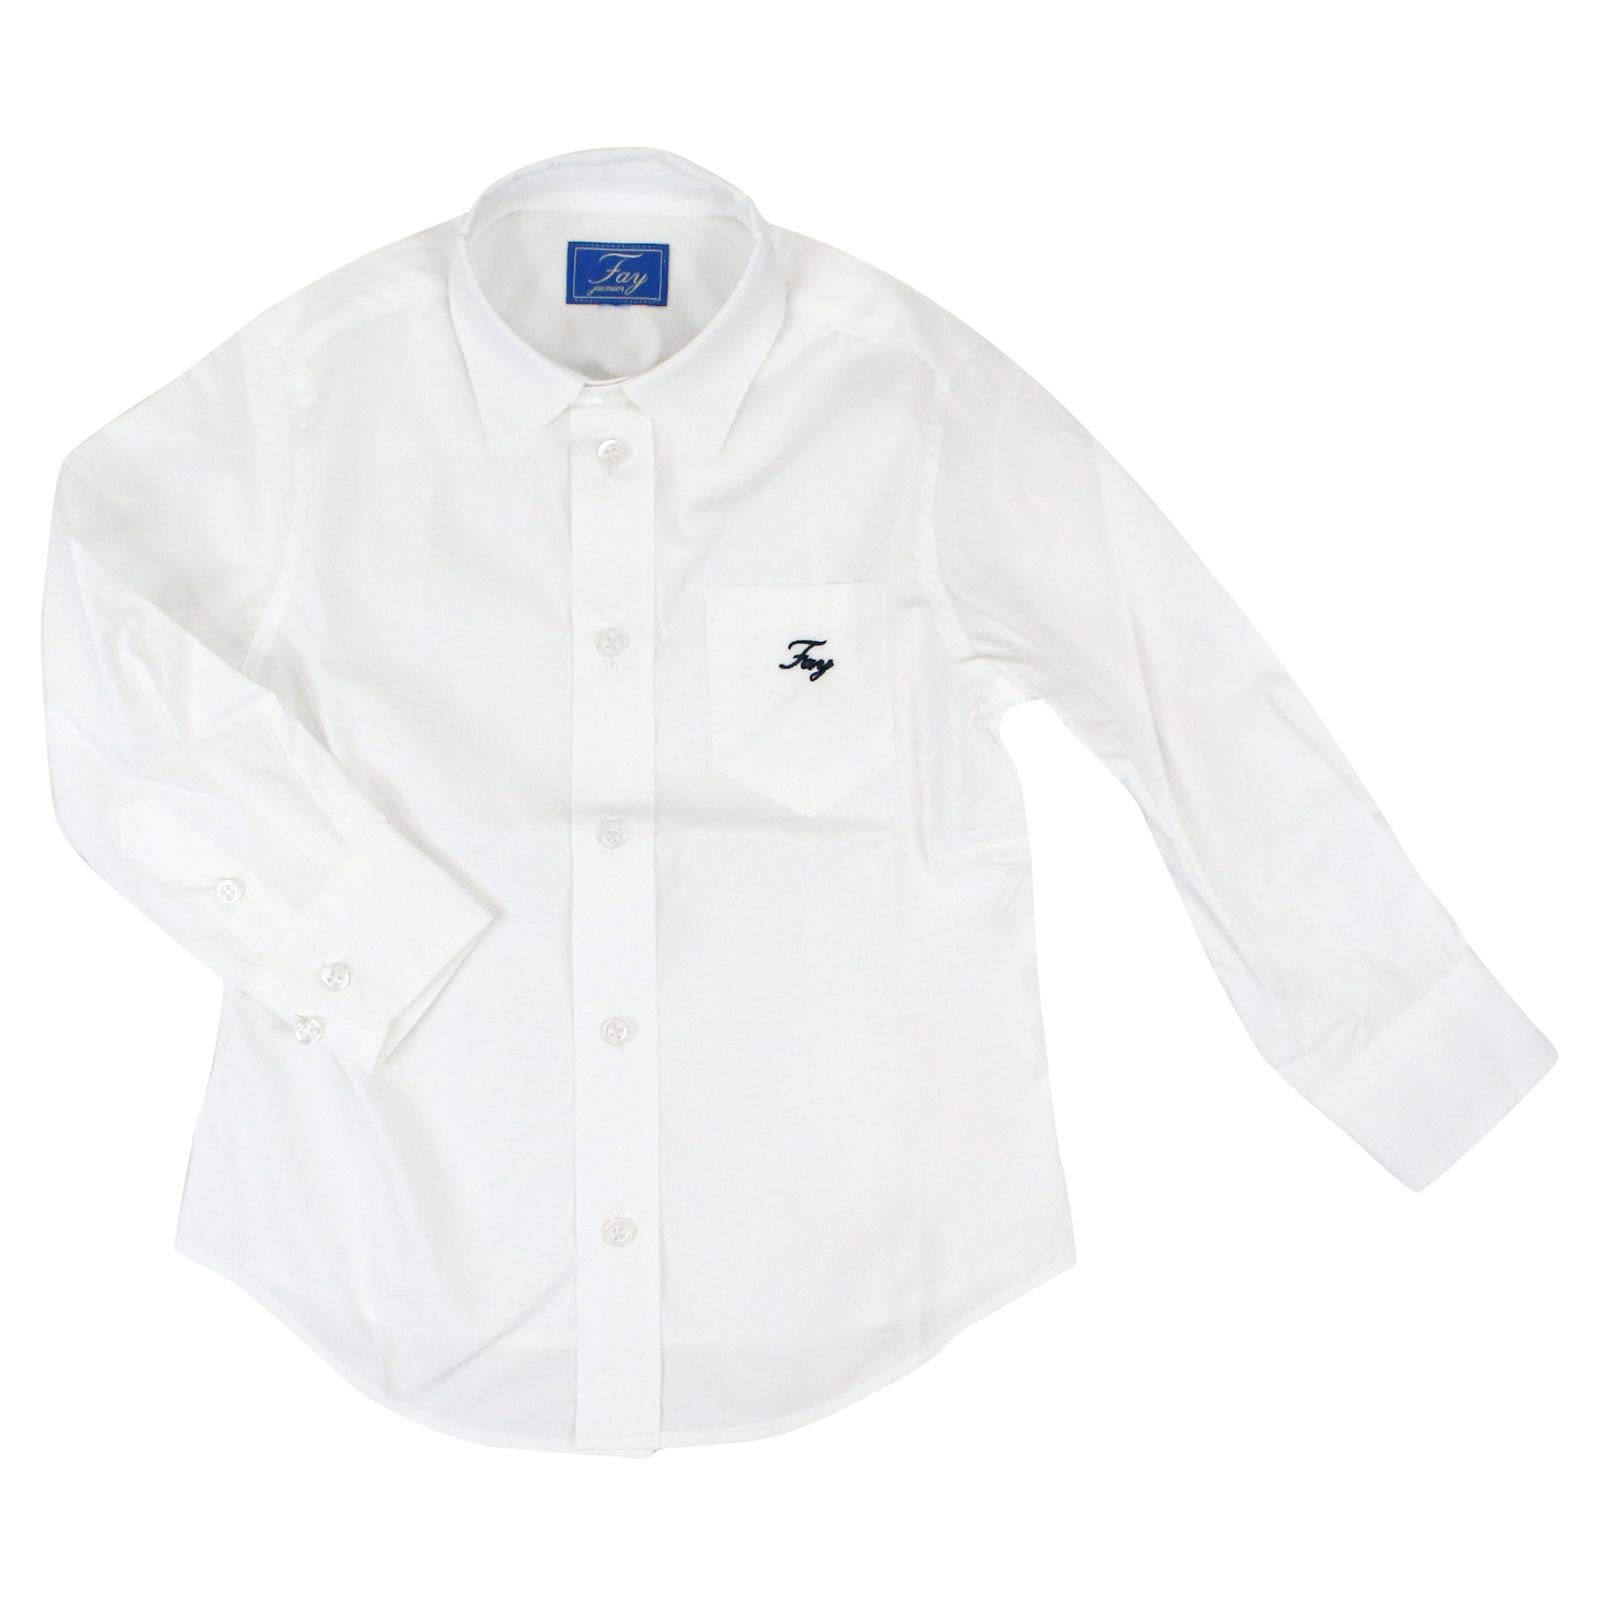 fay Boys Ndha138741lisfb001 White Cotton Shirt